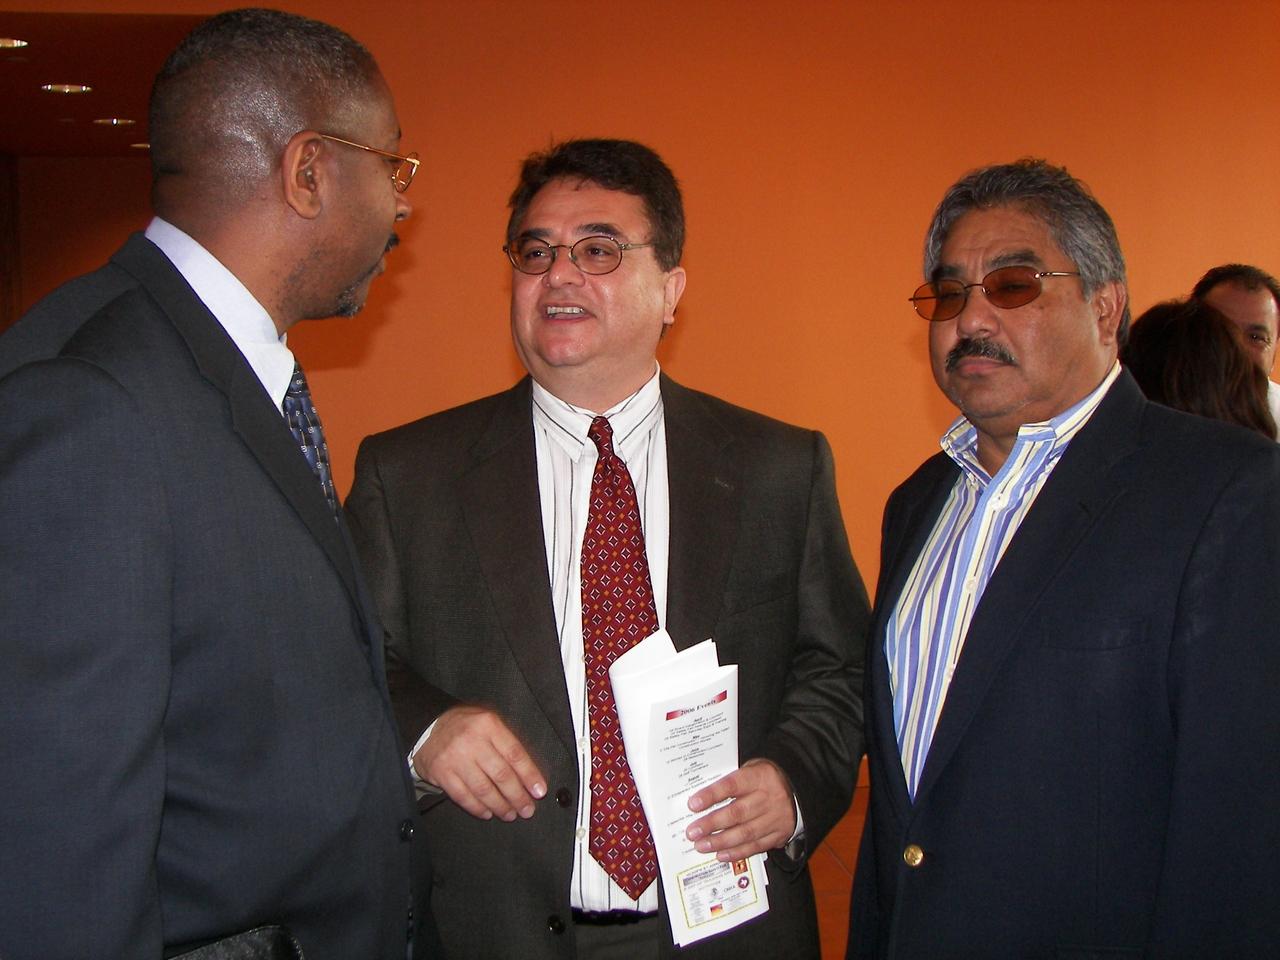 Hopeton Hay, UT System, Chris Escobedo and Felix Galan, DFW Airport